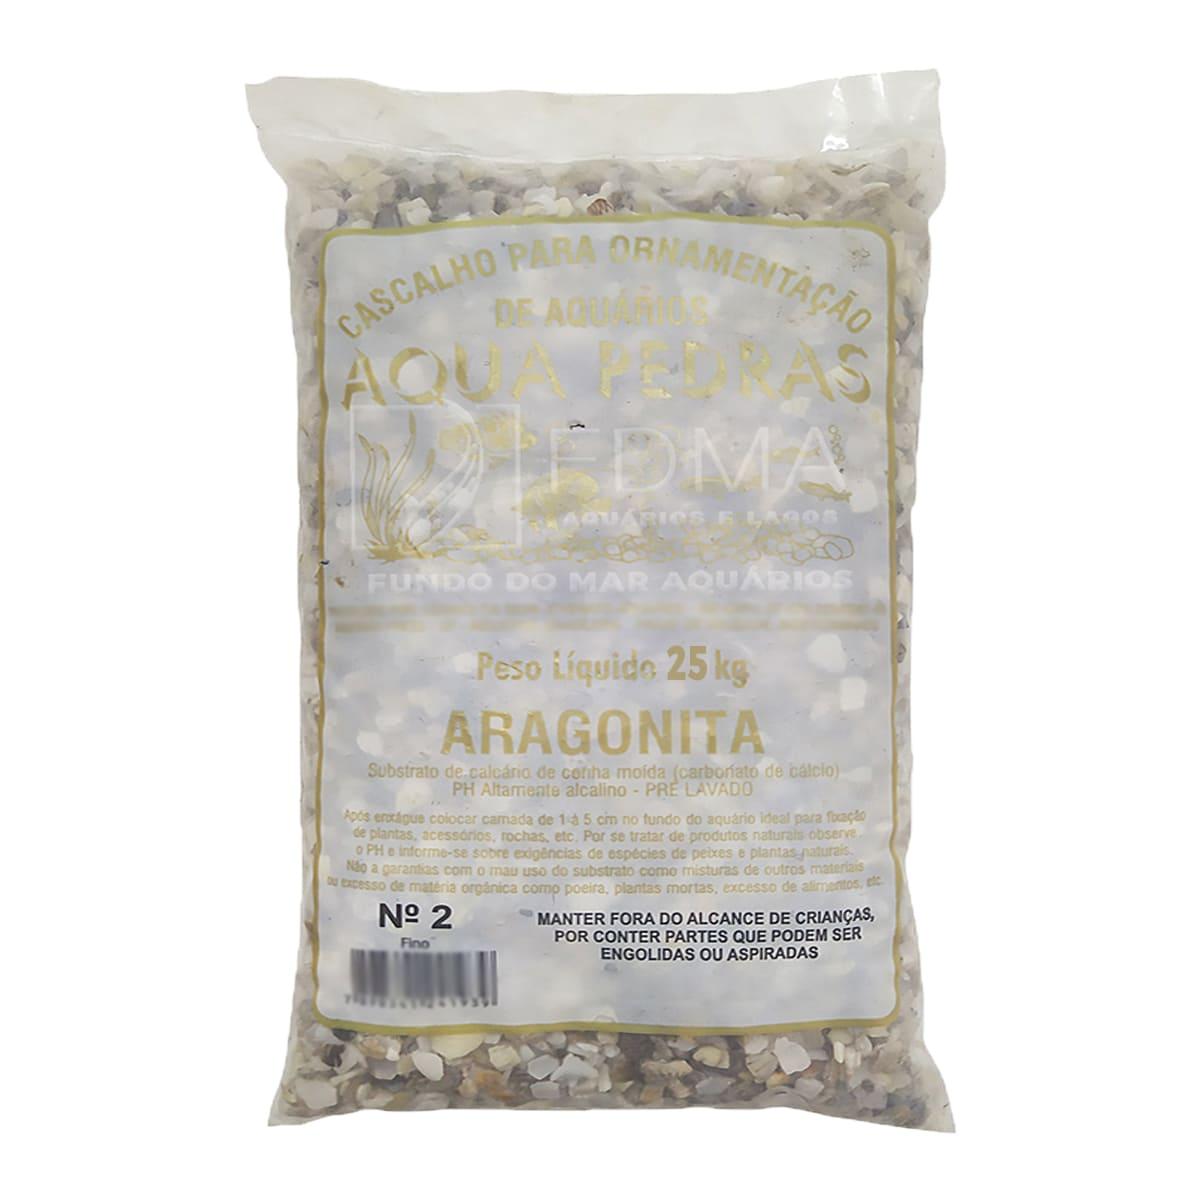 Substrato Aragonita para Aquários e Jardins N°2 - 25kg